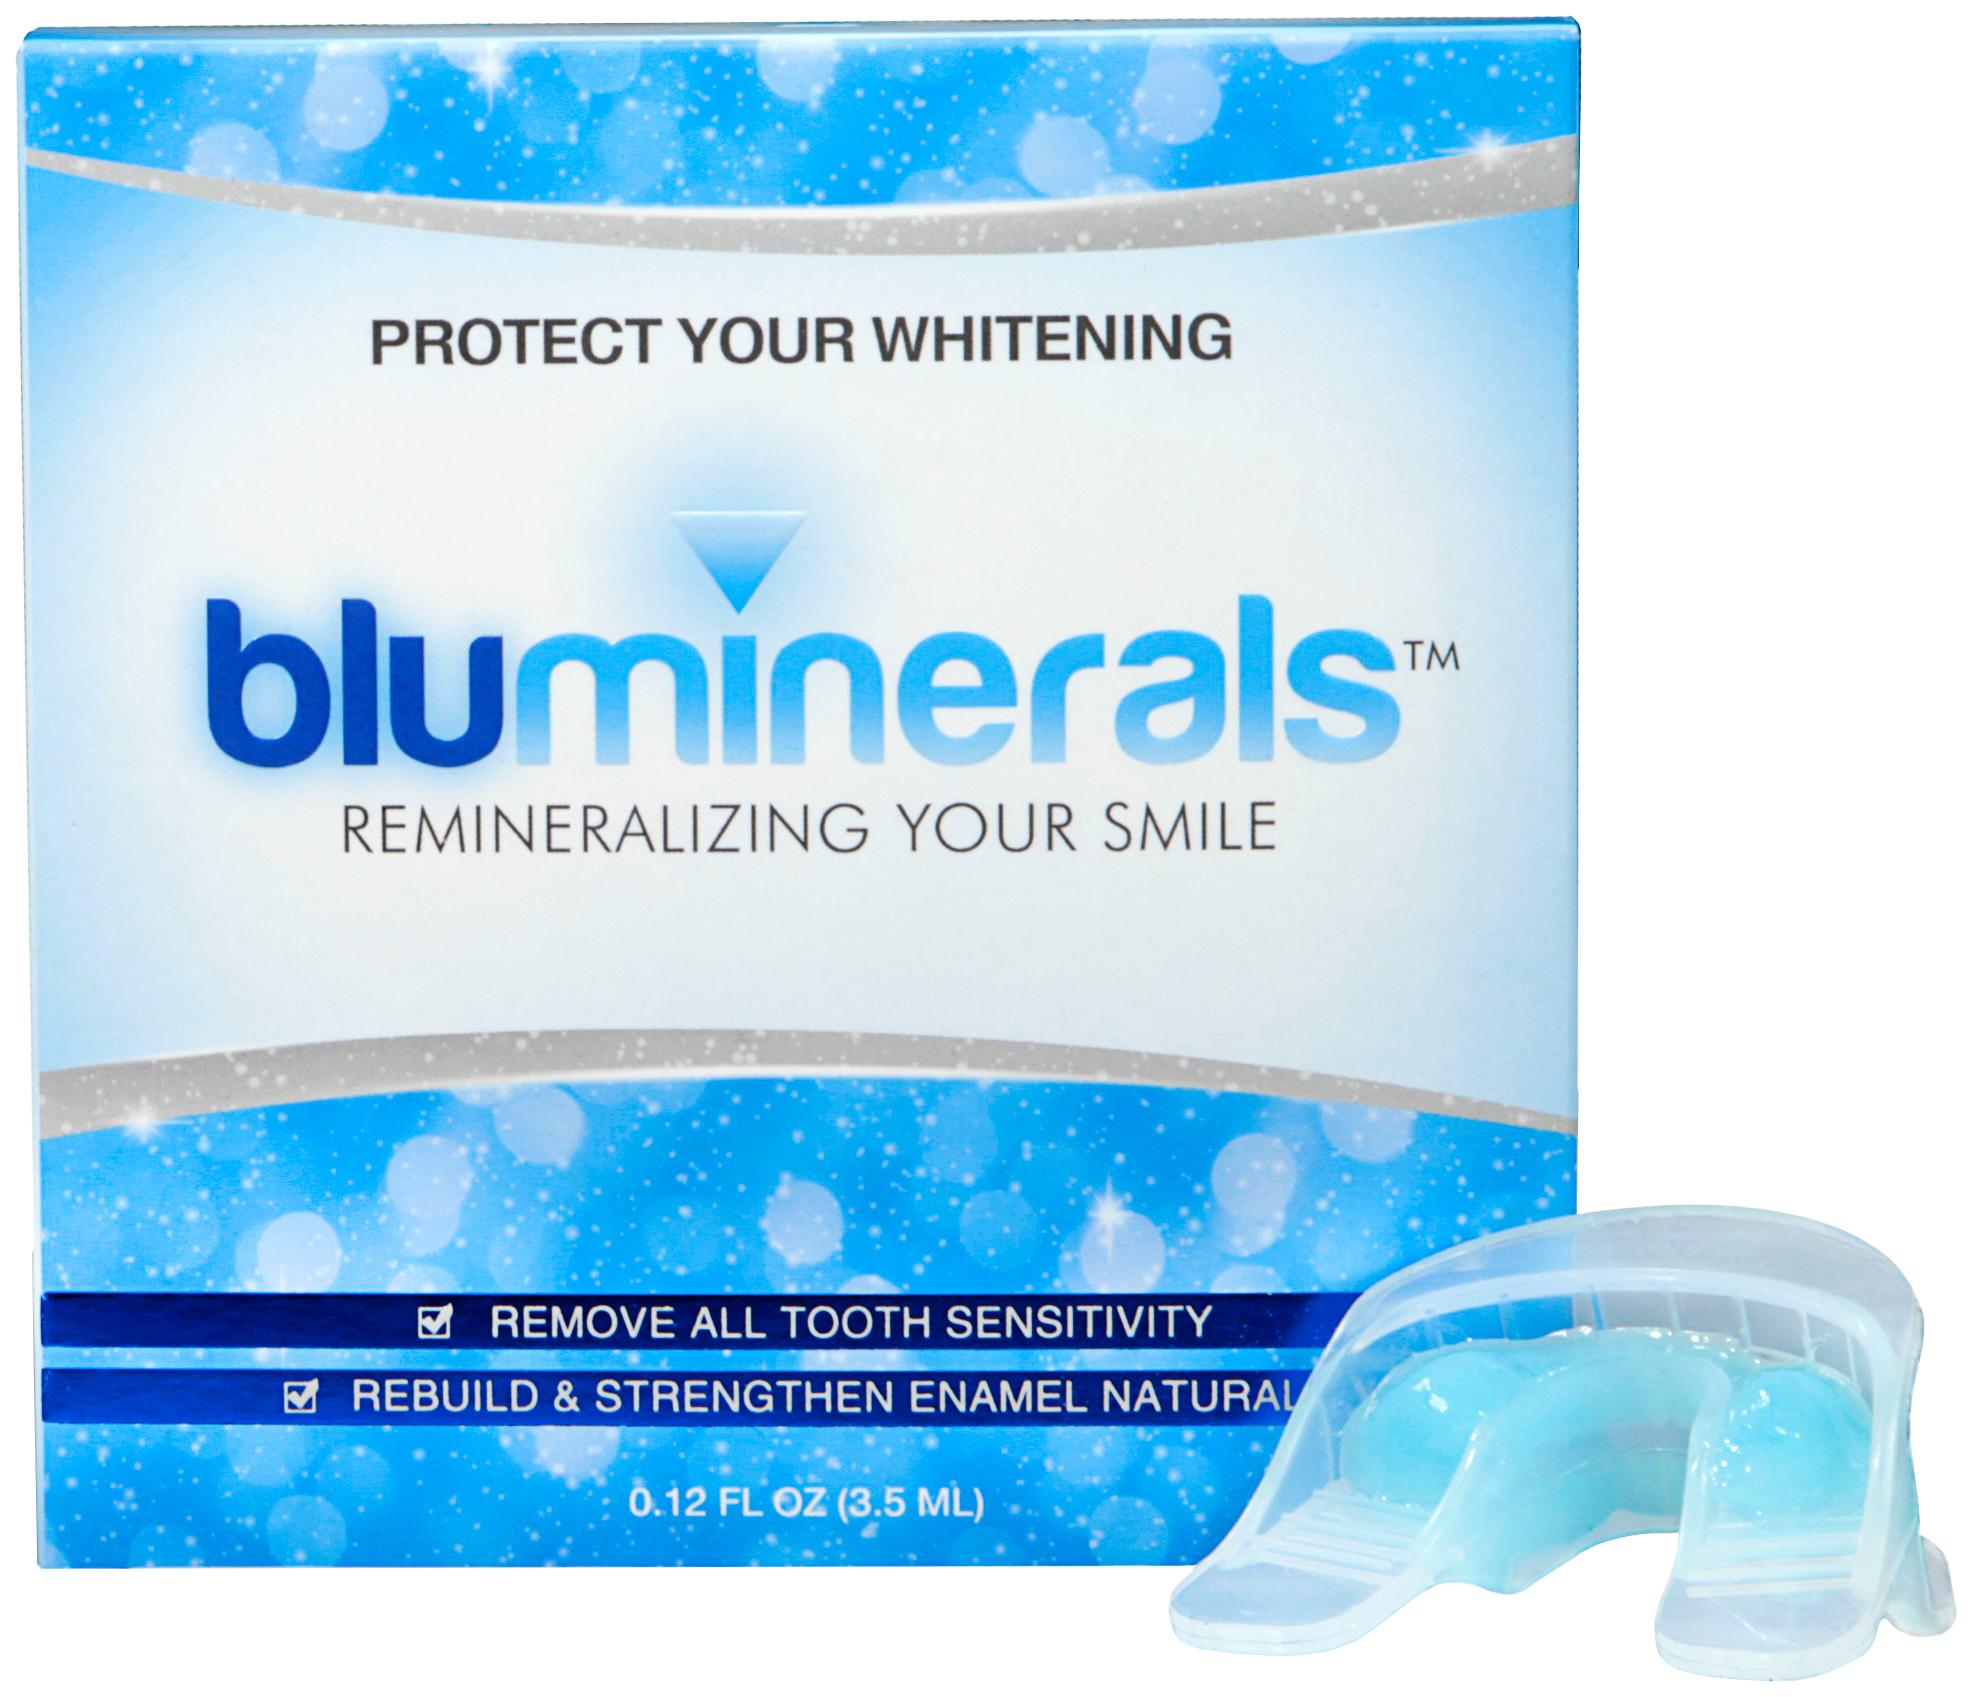 BluMinerals Mouth Piece.jpg